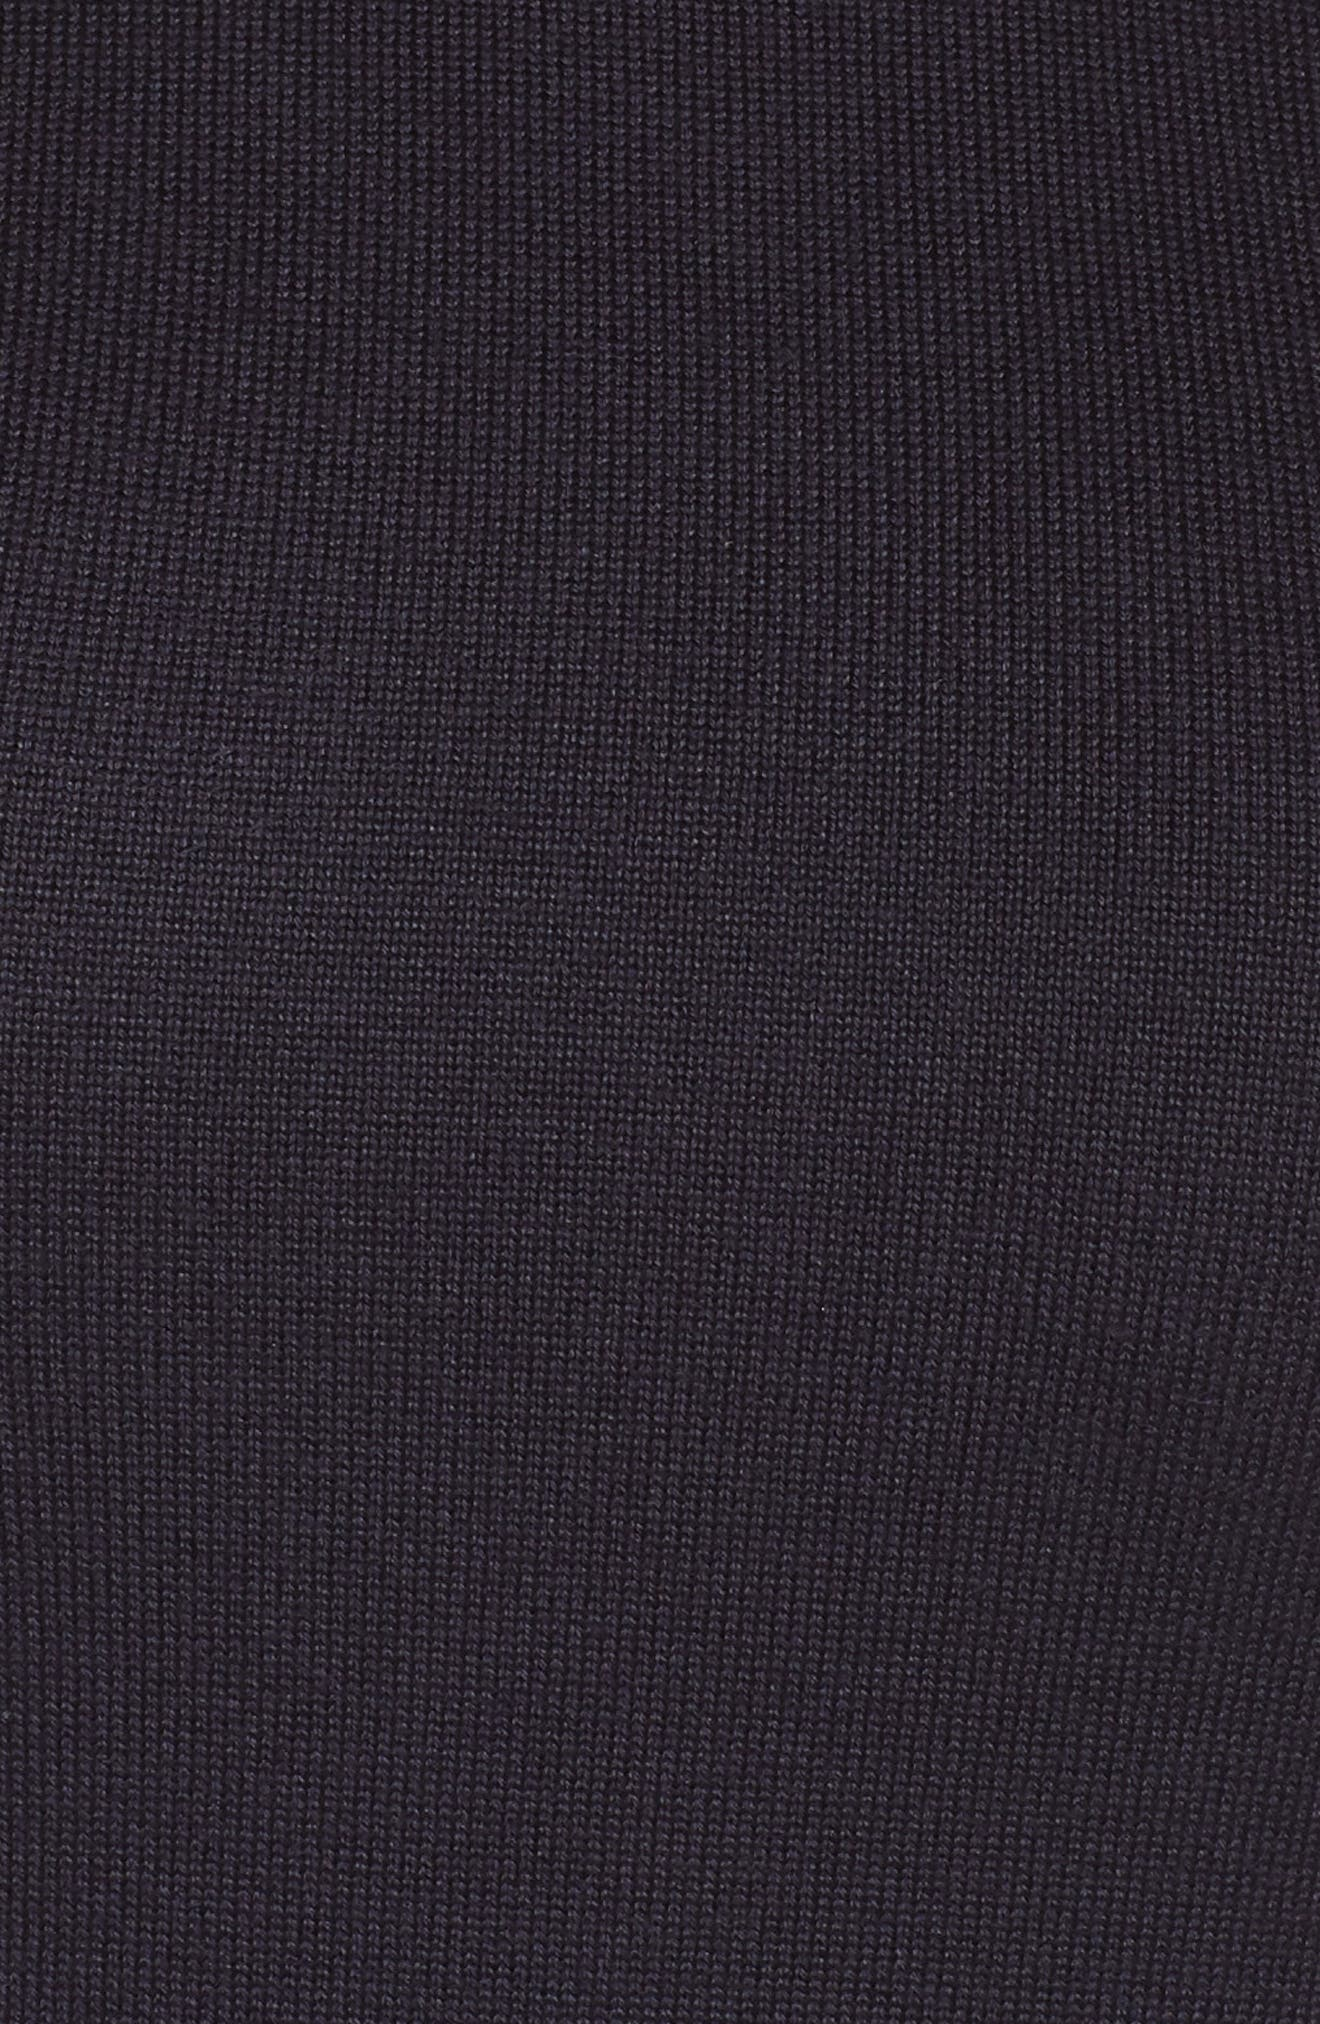 Tie Neck Fit & Flare Dress,                             Alternate thumbnail 6, color,                             NAVY